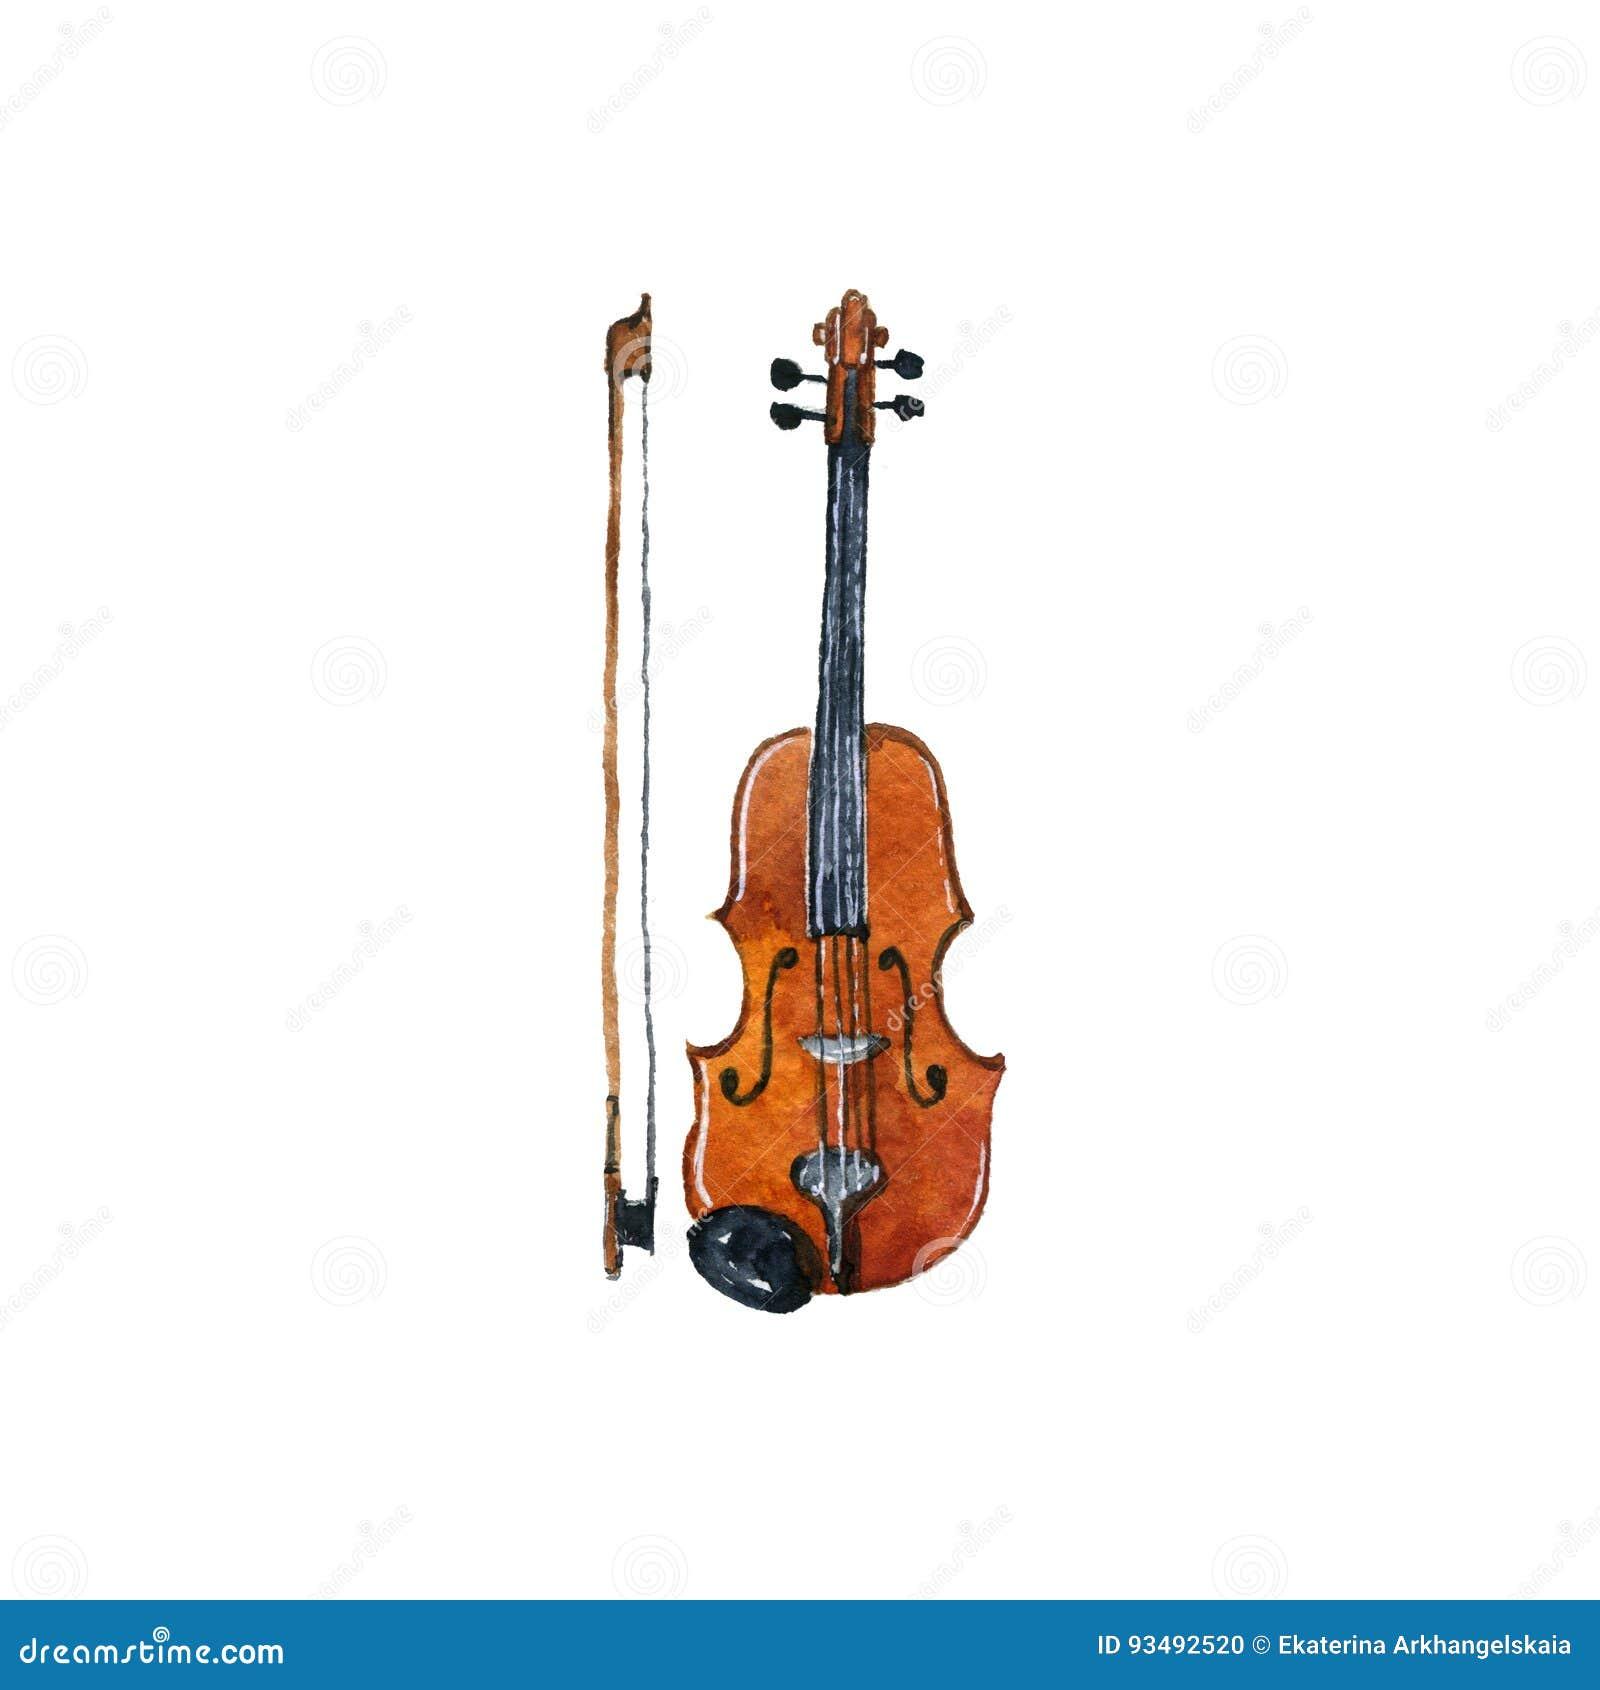 watercolor drawing violin stock illustration illustration of image